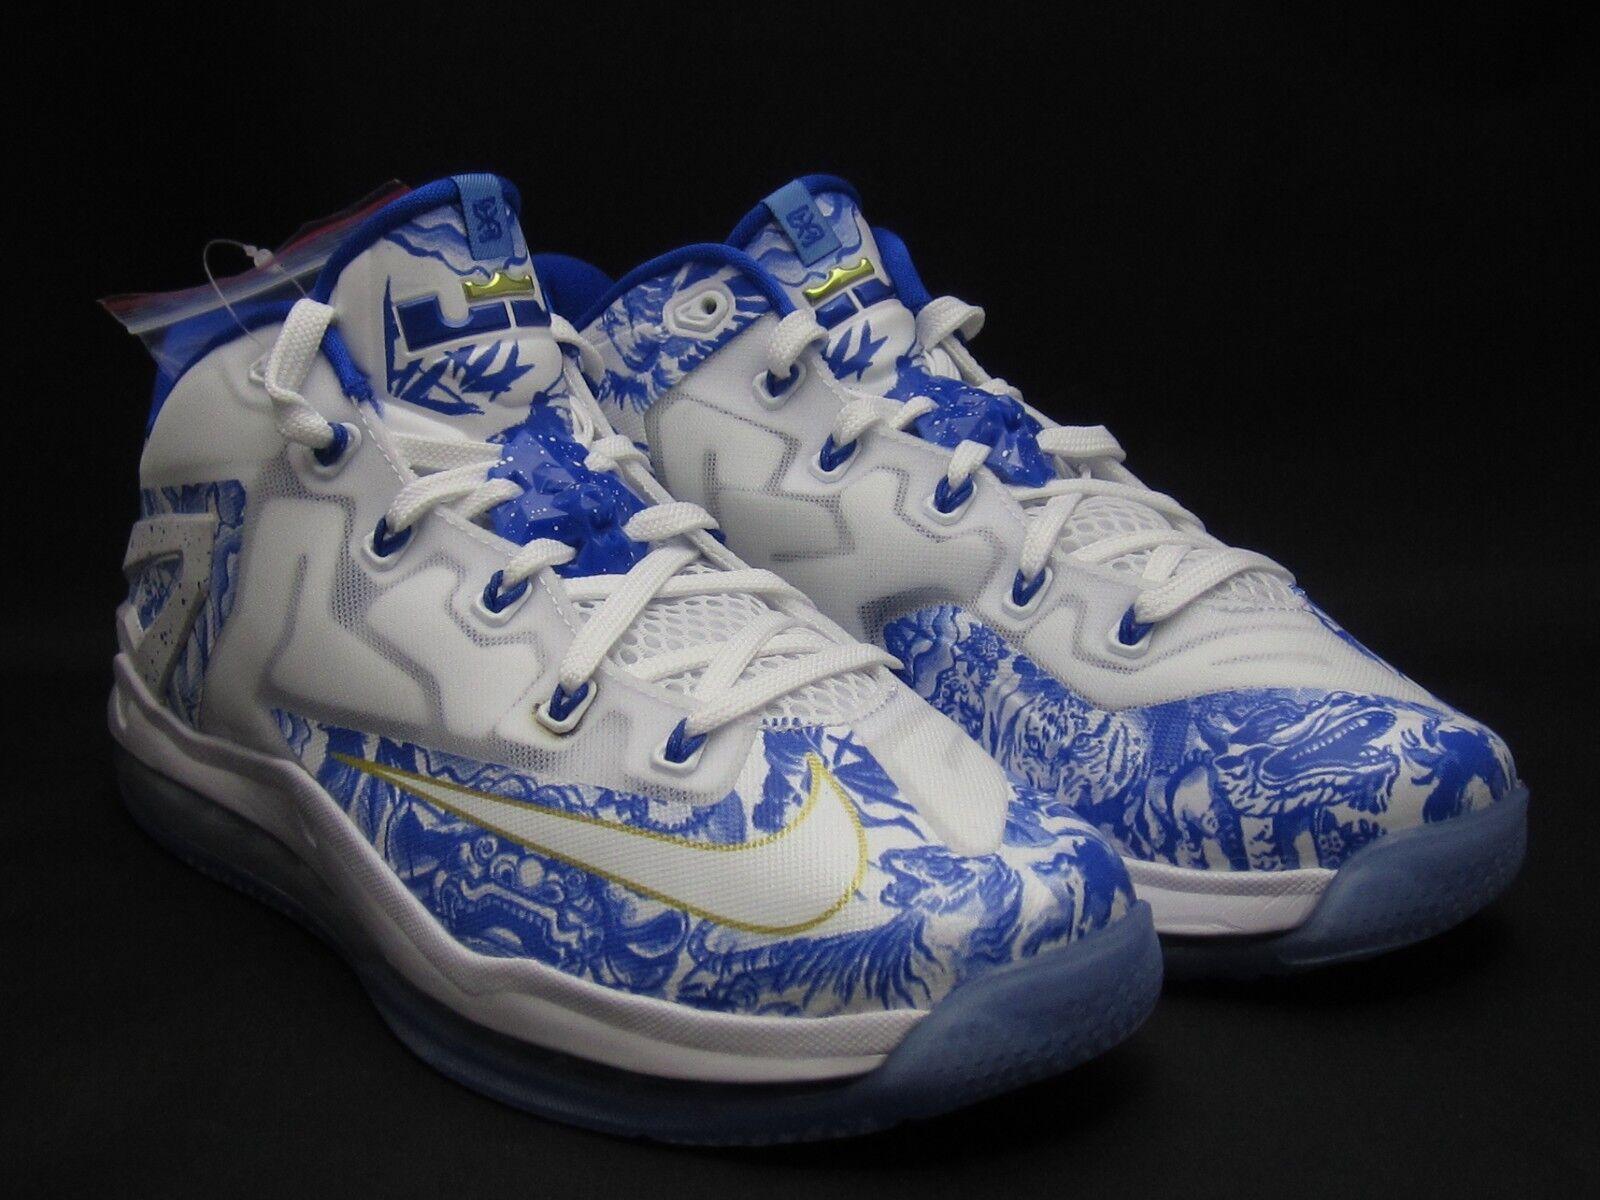 2018 Nike Max LeBron XI baja China China China Pack 9,5 blanco azul cobalto 683253-144 Ch 11 ds el mas popular de zapatos para hombres y mujeres f6ba39